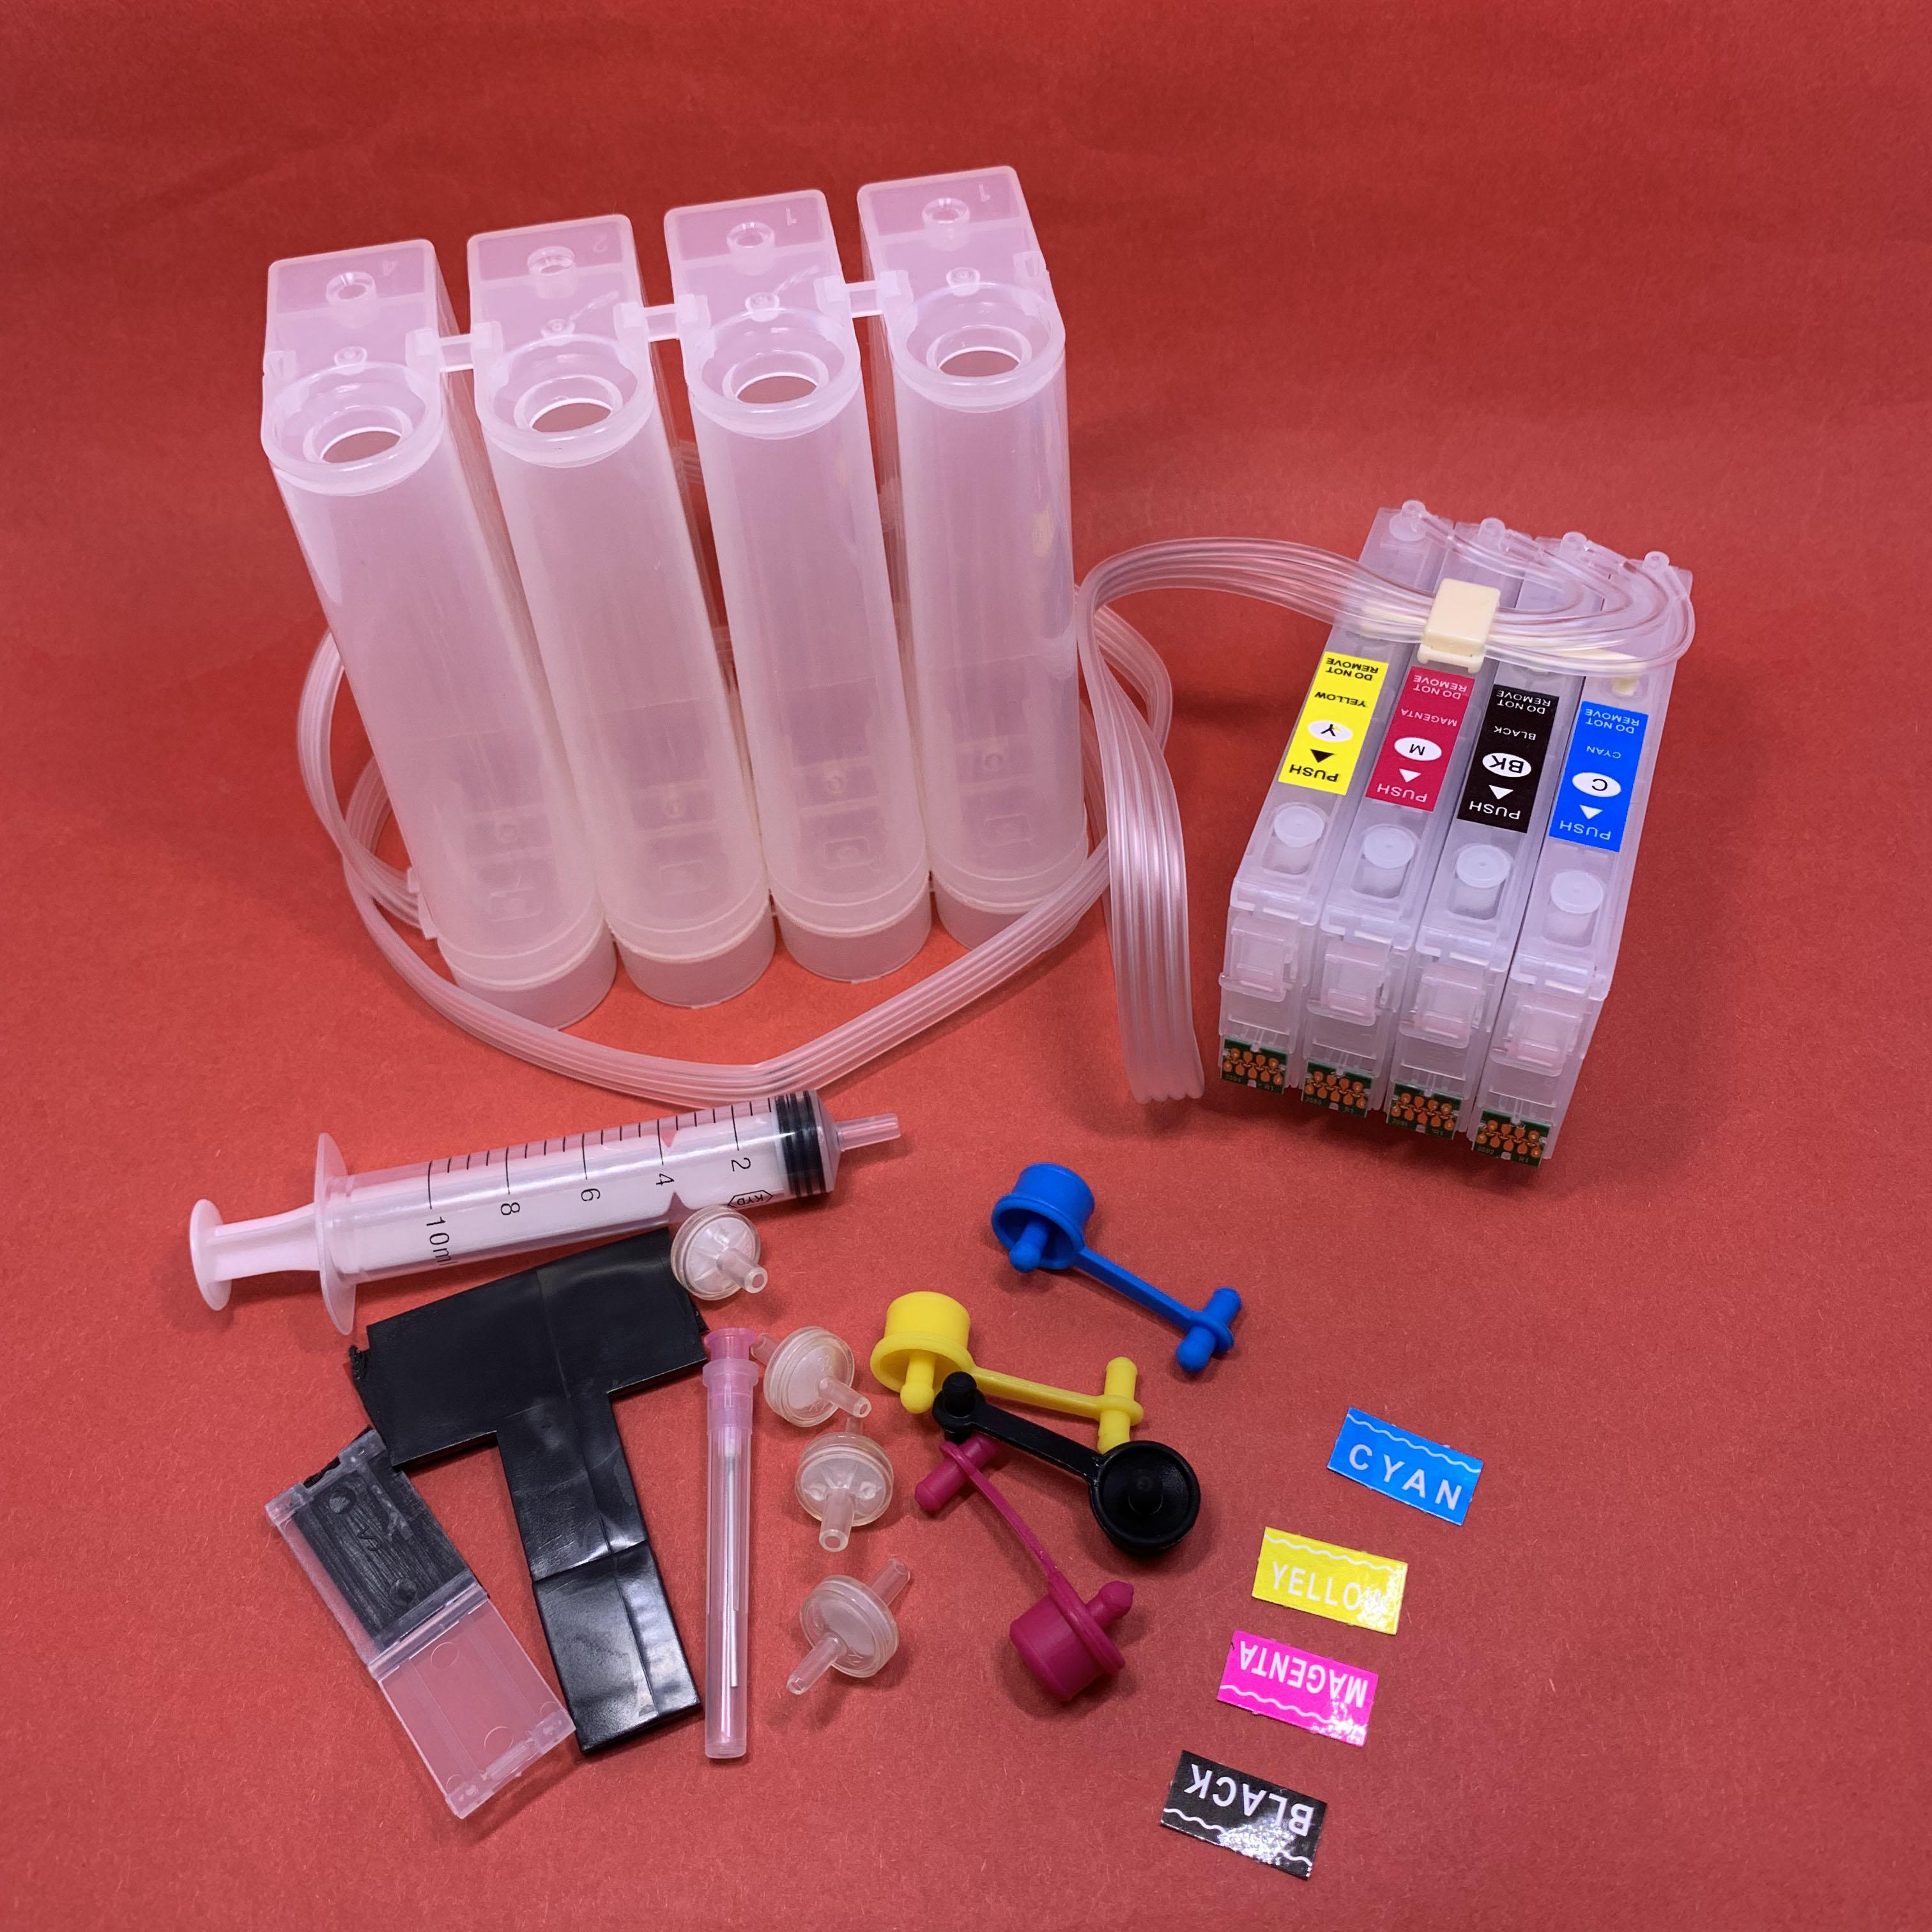 YOTAT CISS T3591-T3594 cartucho de tinta con arco chip 35XL T359XL para Epson Pro WF-4720 WF-4725 WF-4740